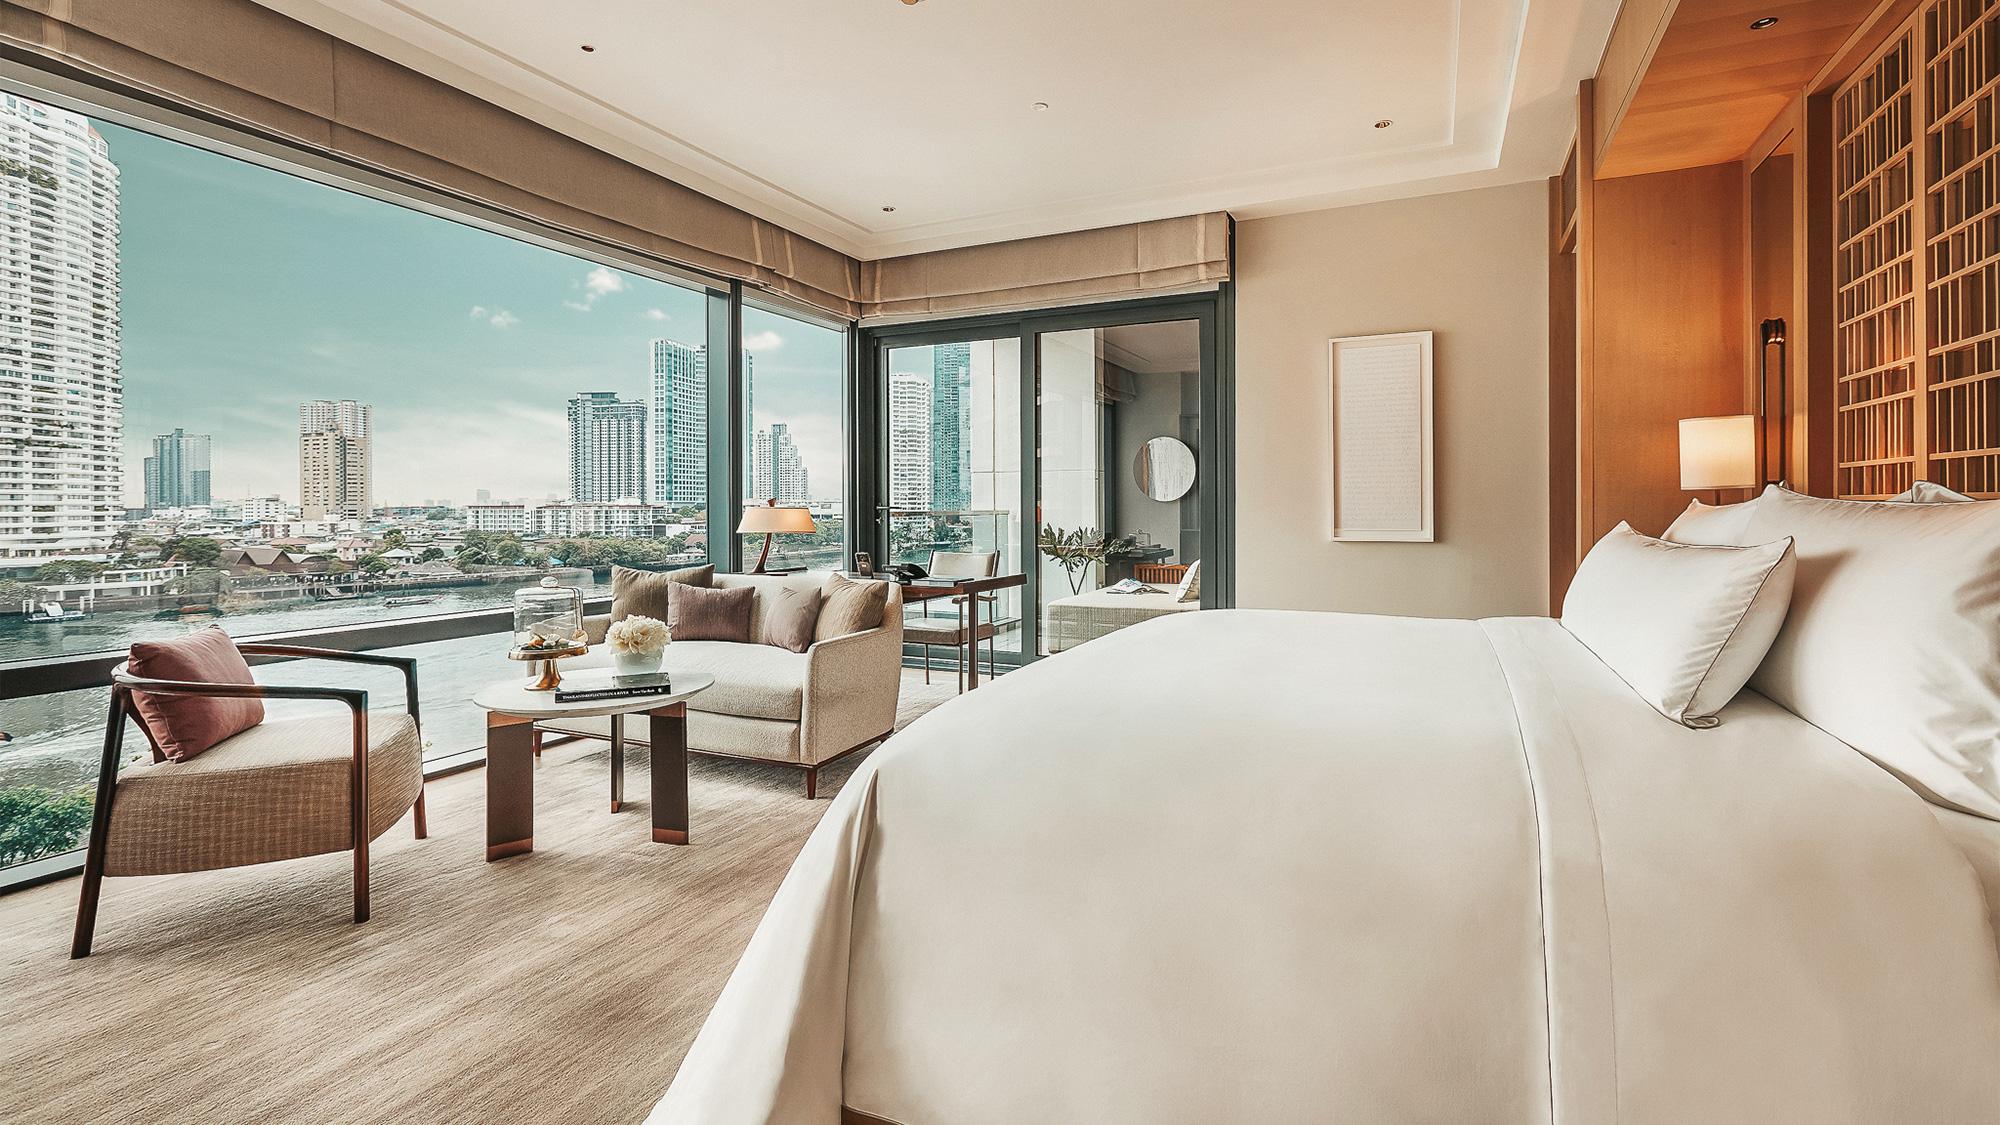 A guestroom at the Capella Bangkok overlooking the Chao Phraya River.